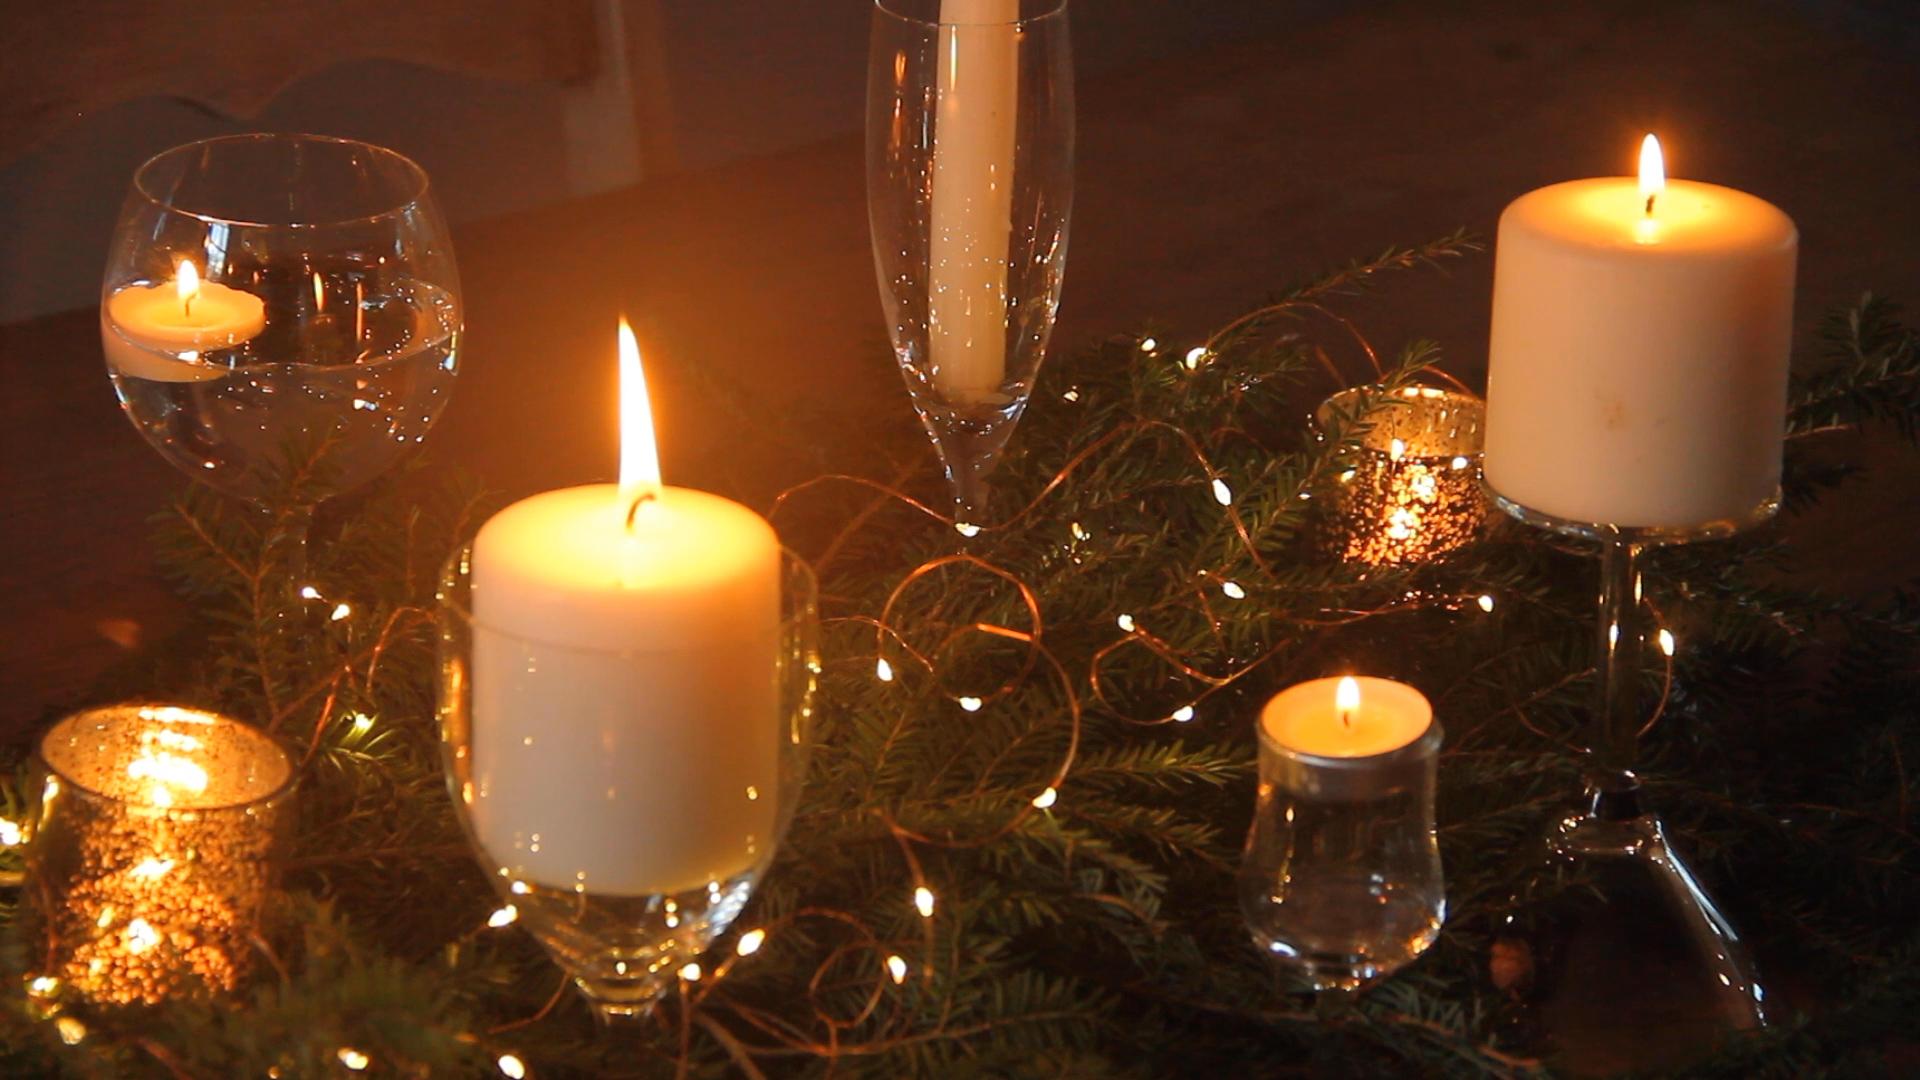 lit candles 4.jpg